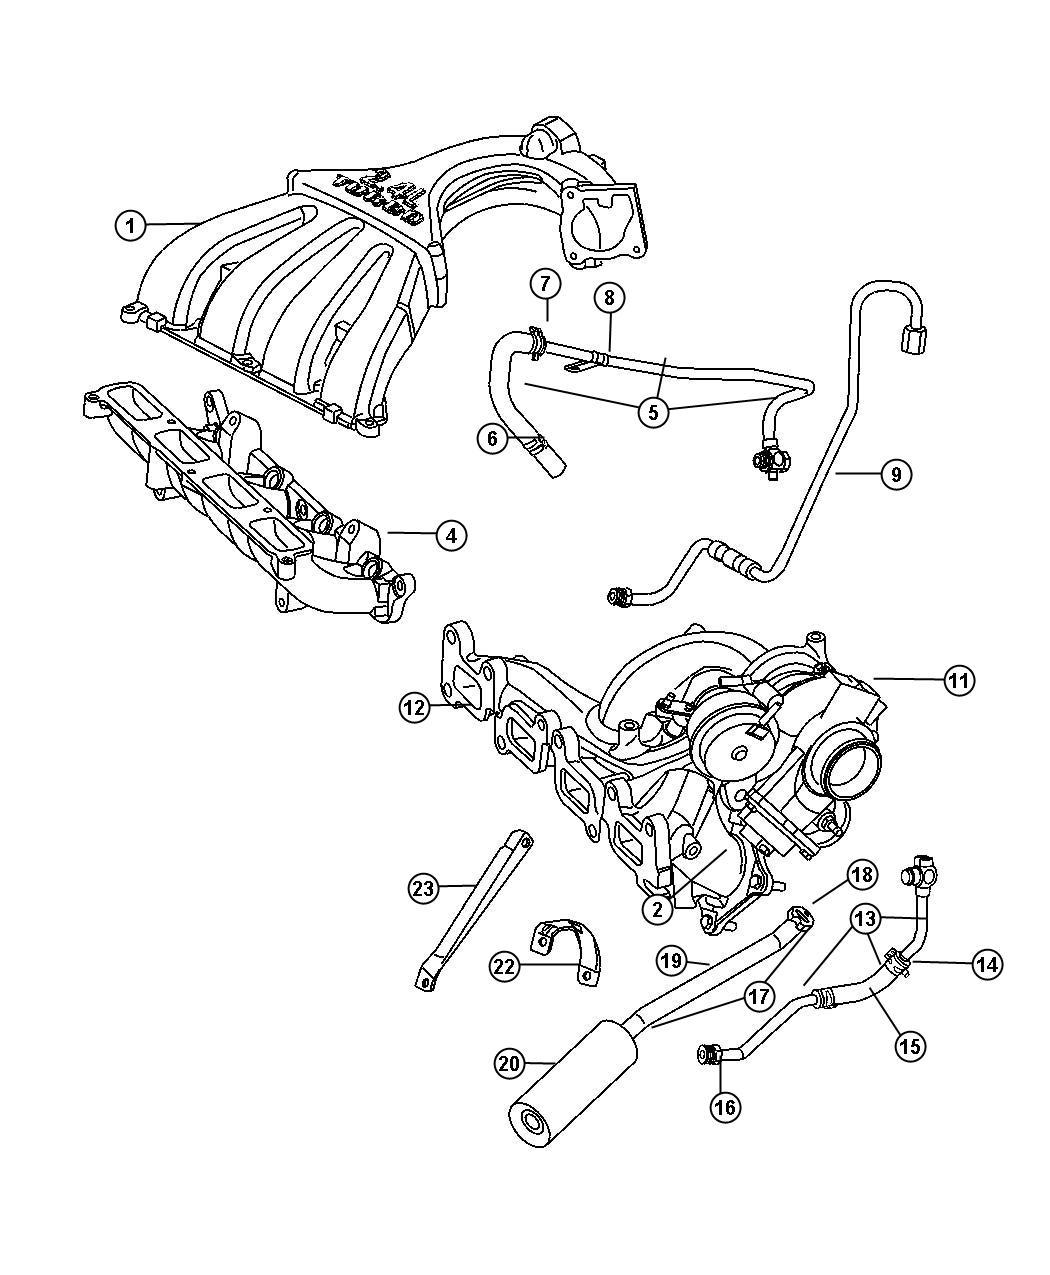 Dodge Neon Tube. Turbo oil feed. Manifold, exhaust